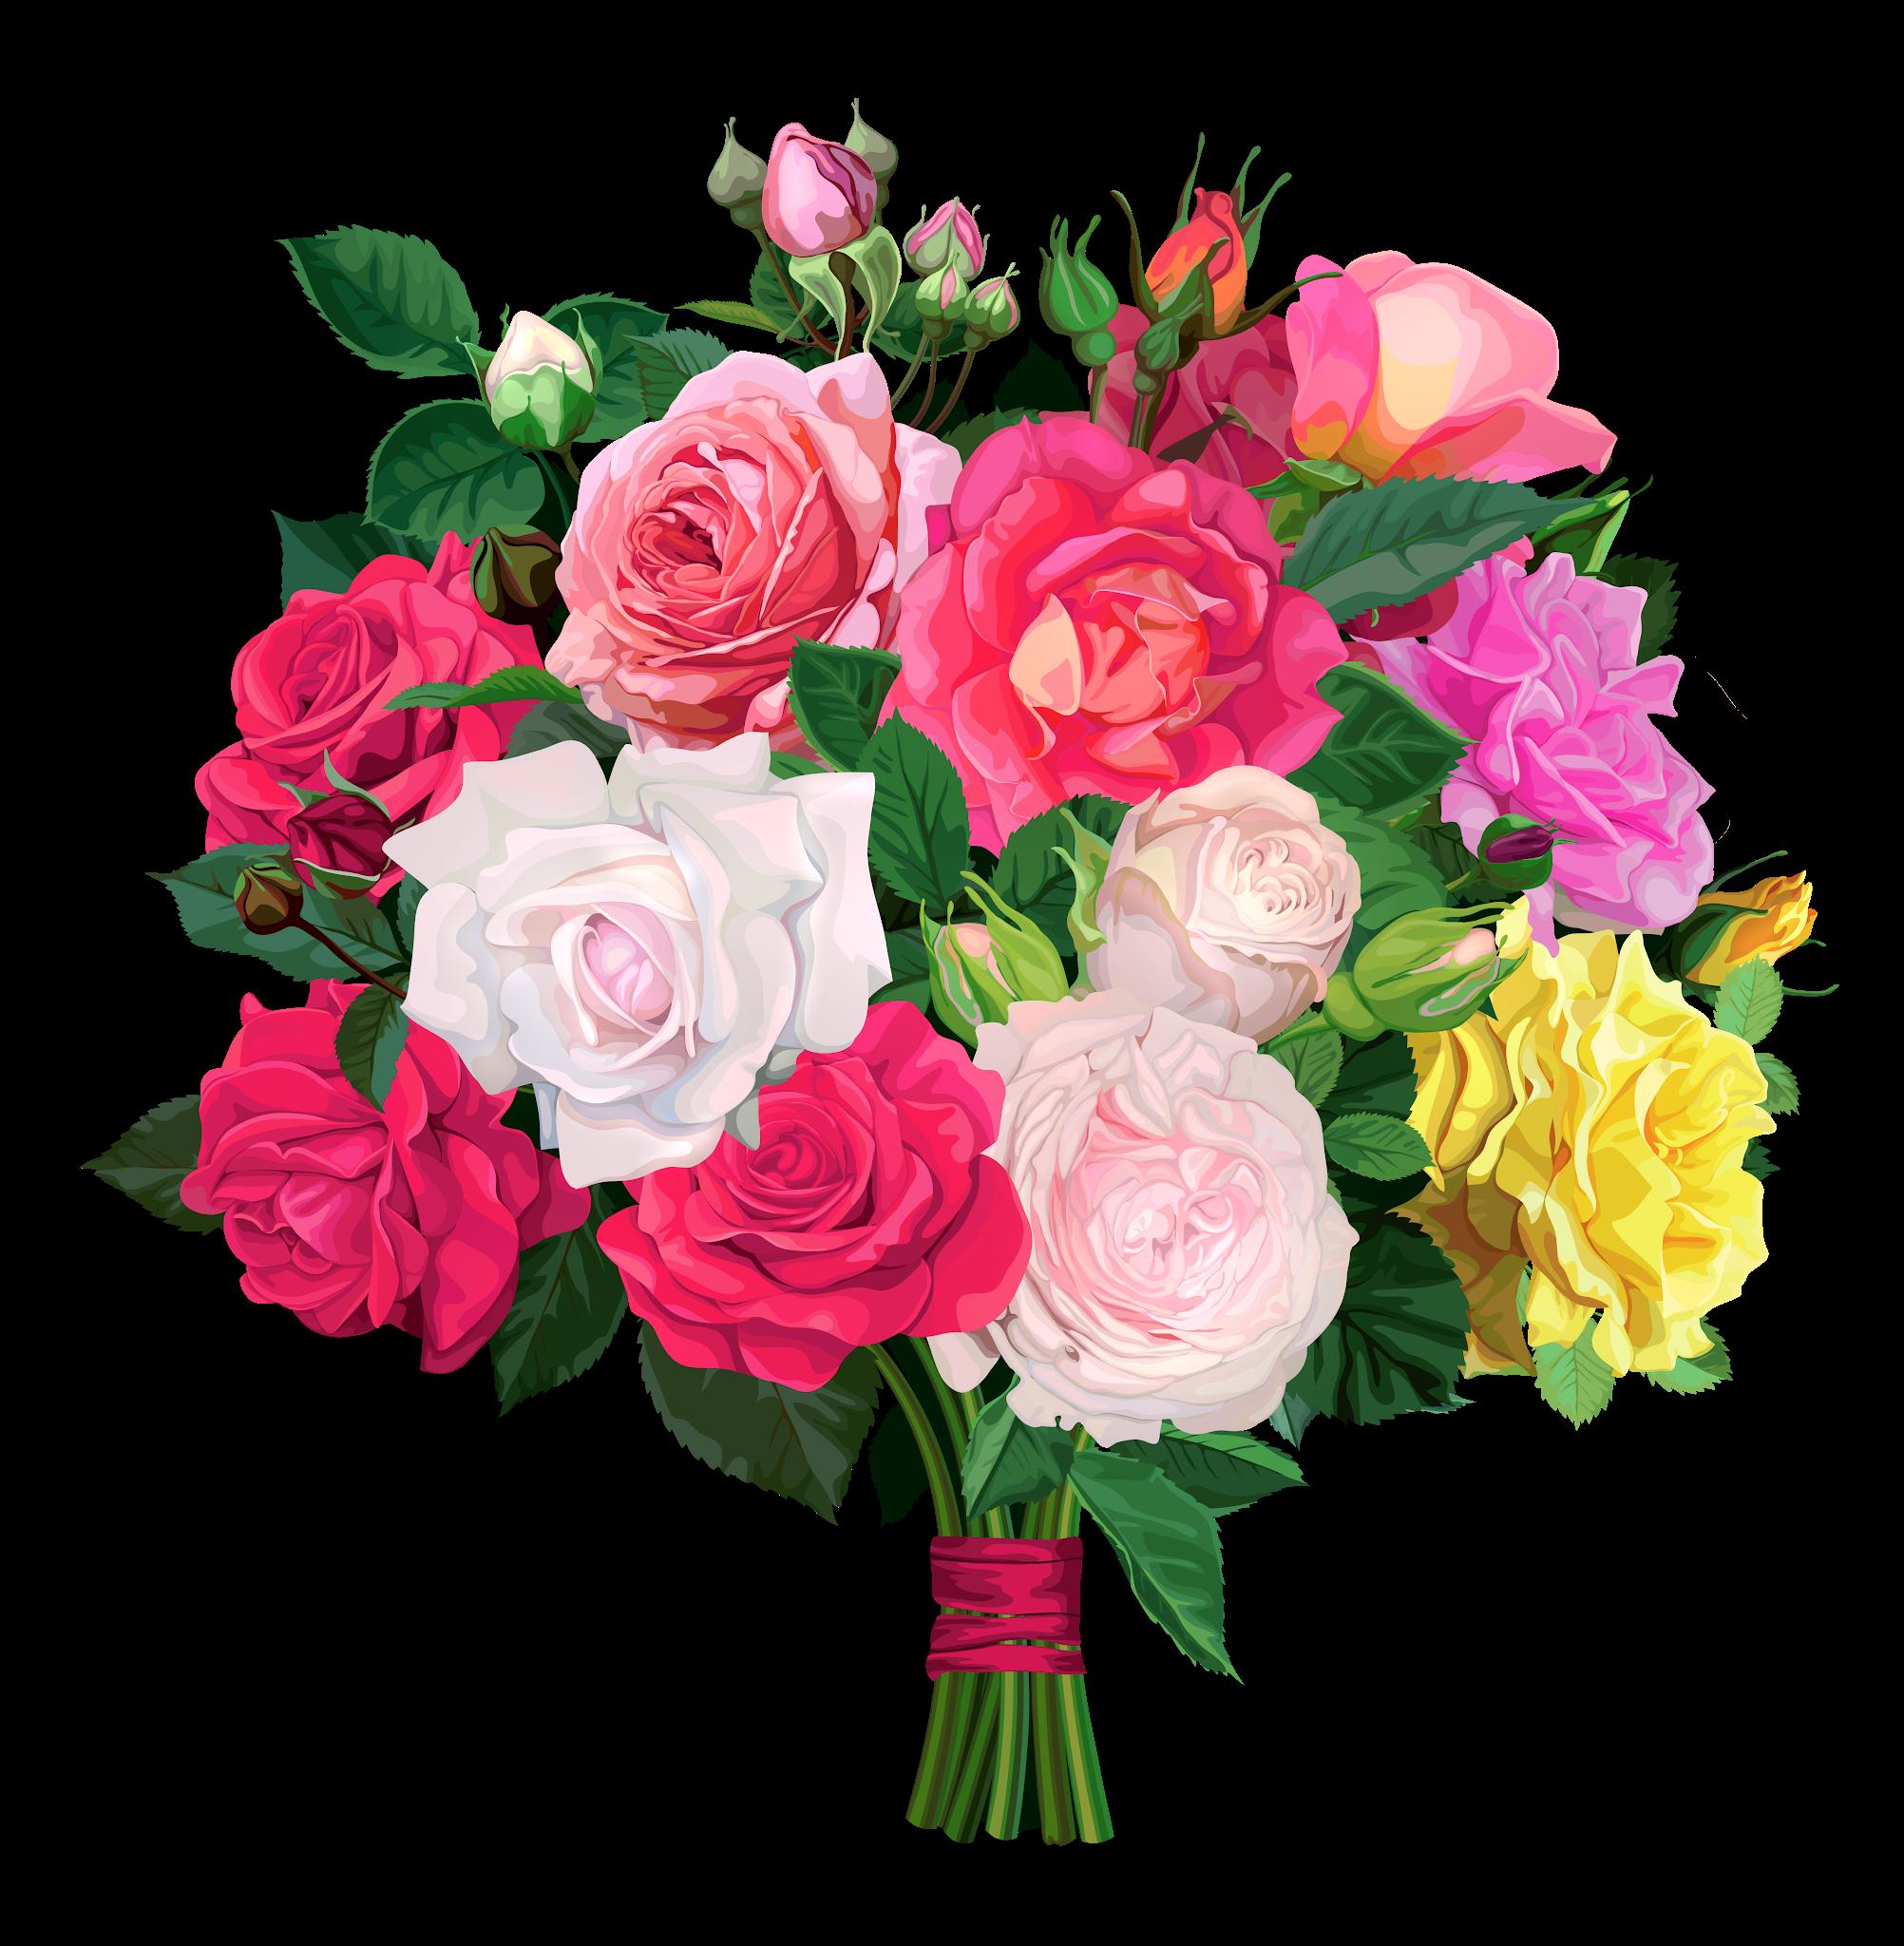 Flower Bouquet Birthday Gift Red Roses Bouquet Png Clipart Flower Pots Flower Bouquet Png Flower Pot Garden